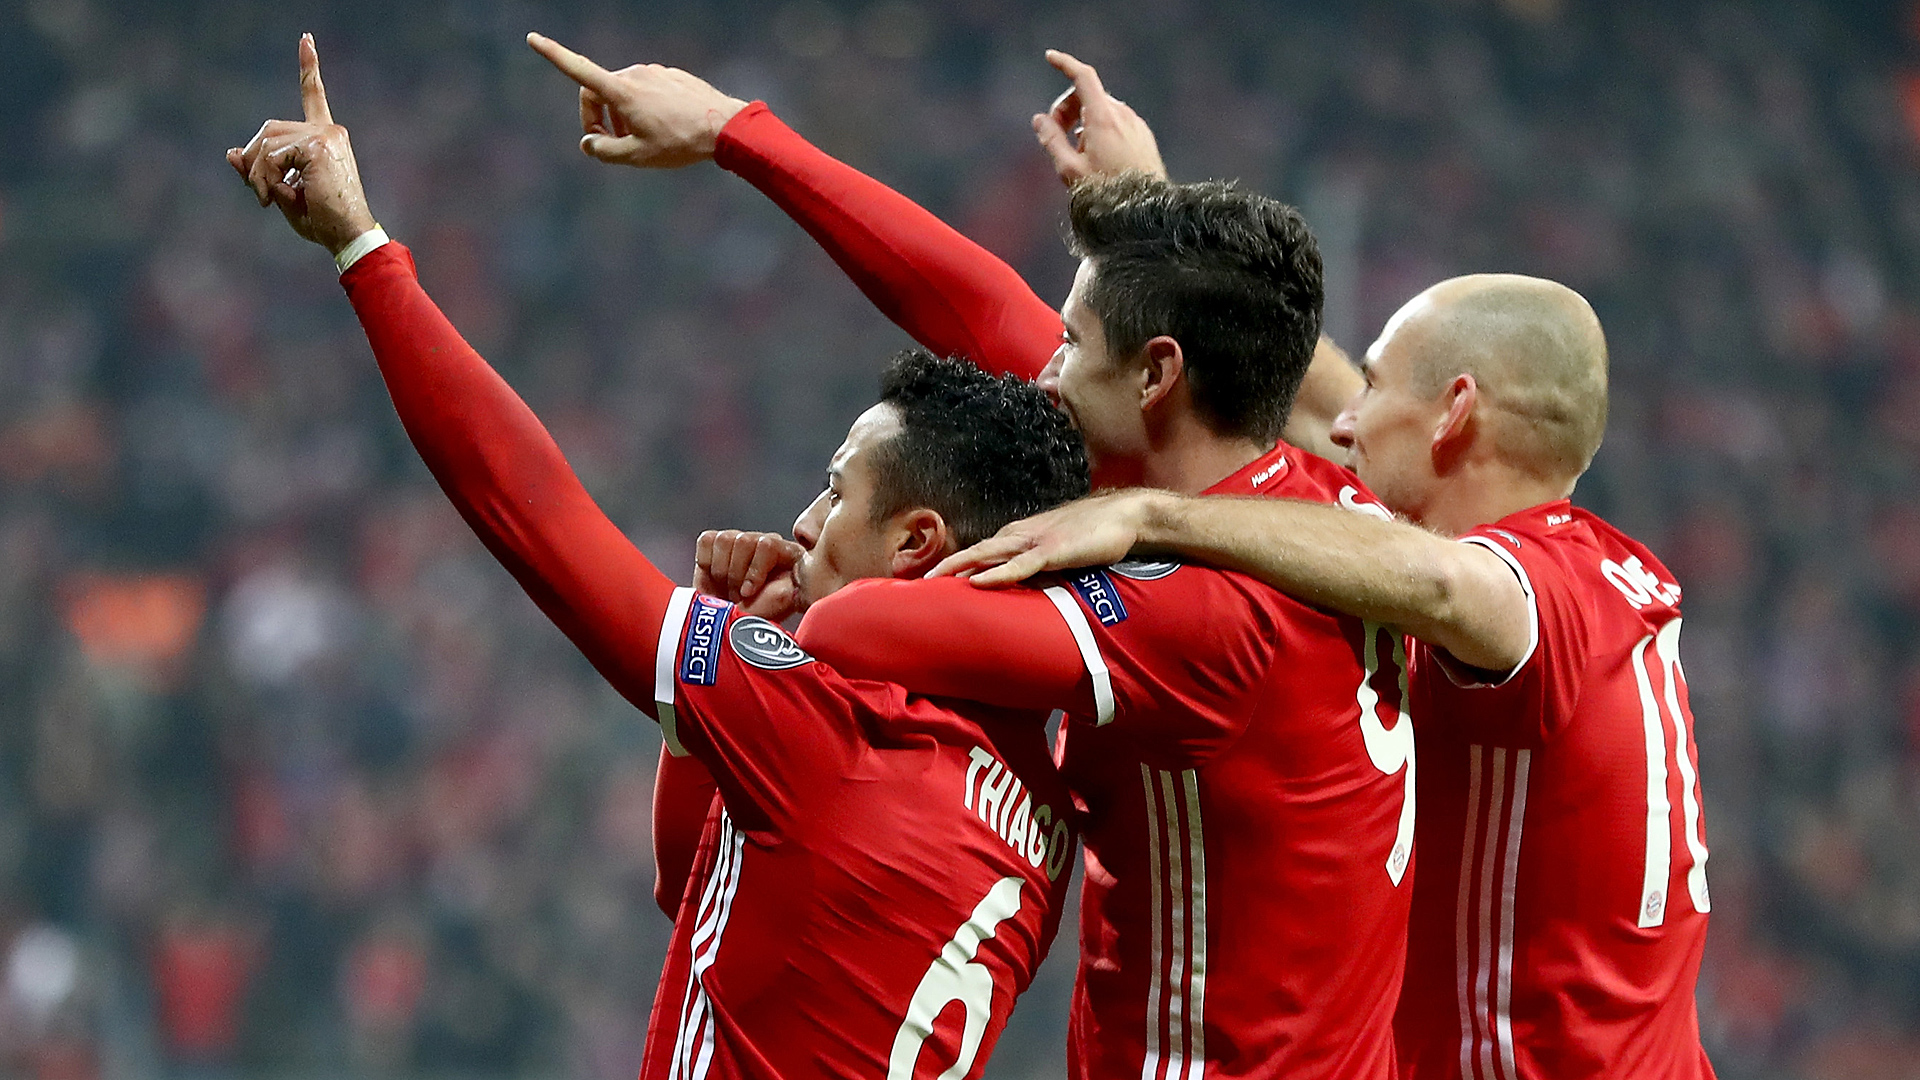 Bayern empfängt Arsenal ohne Boateng und Ribery